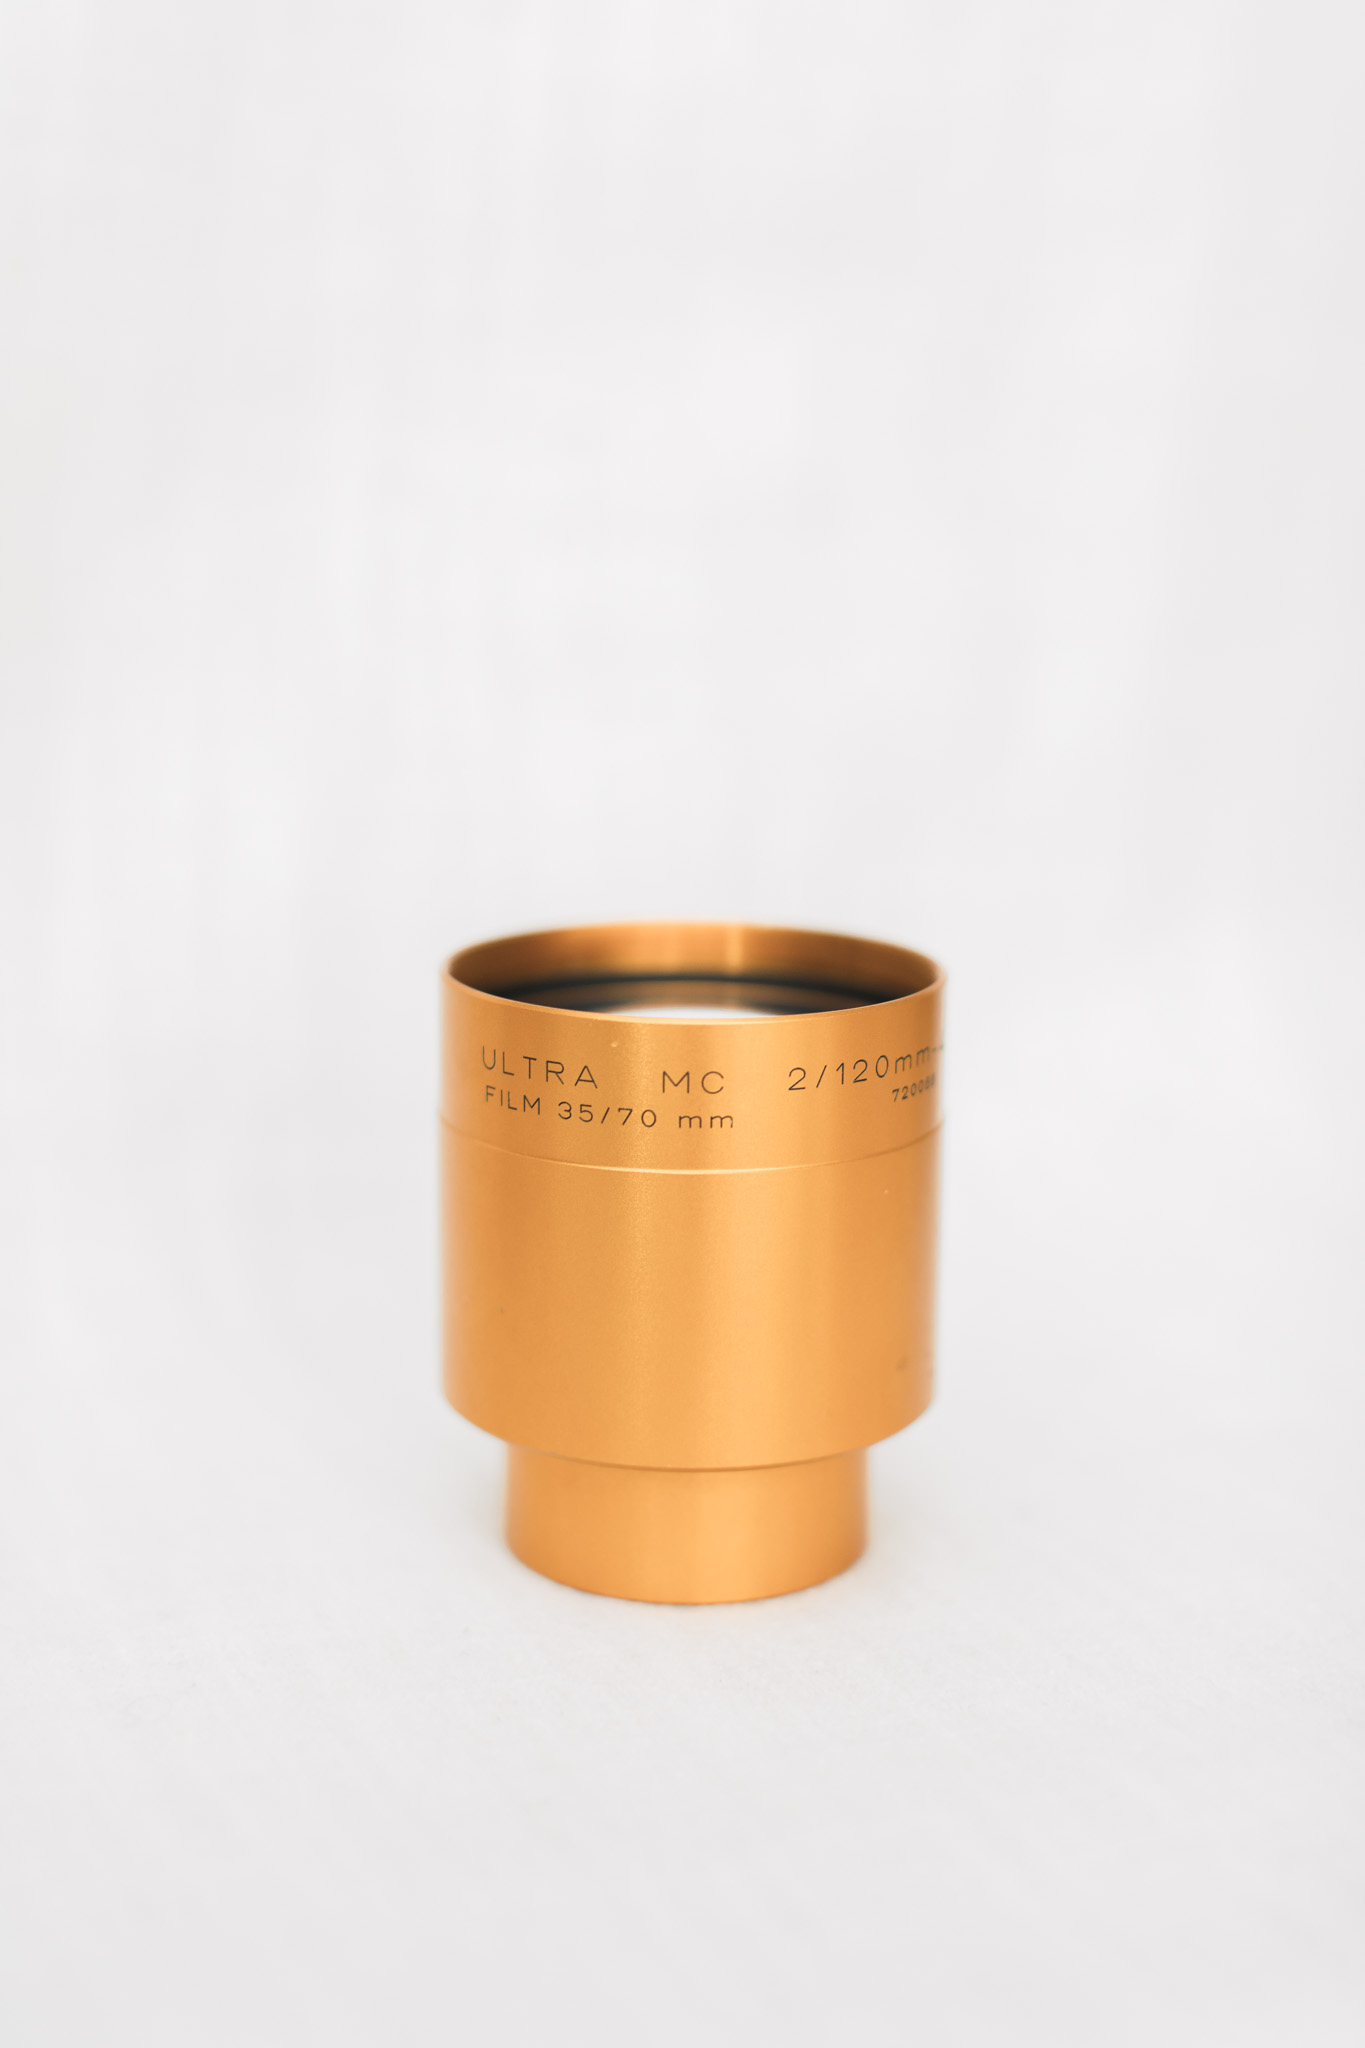 ISCO Ultra MC 120mm f/2 Lens